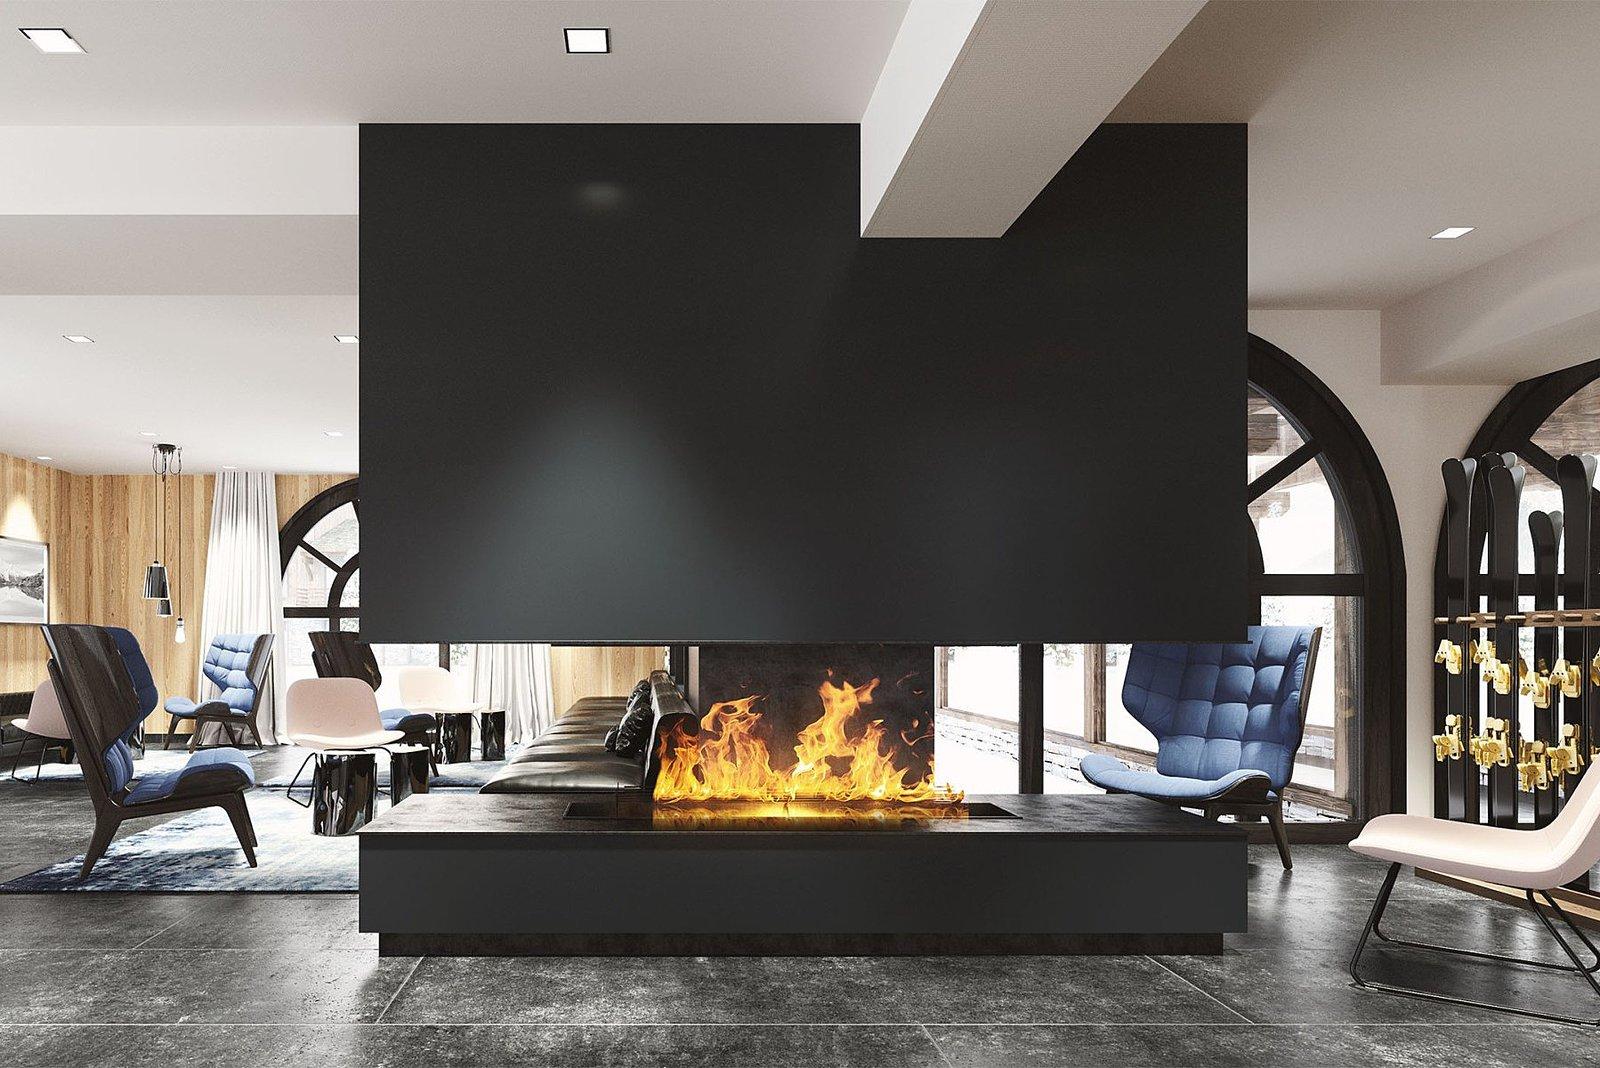 https://cdn.dealeusedevoyages.com/files/nw2017_cordee_fireplace_0.jpg